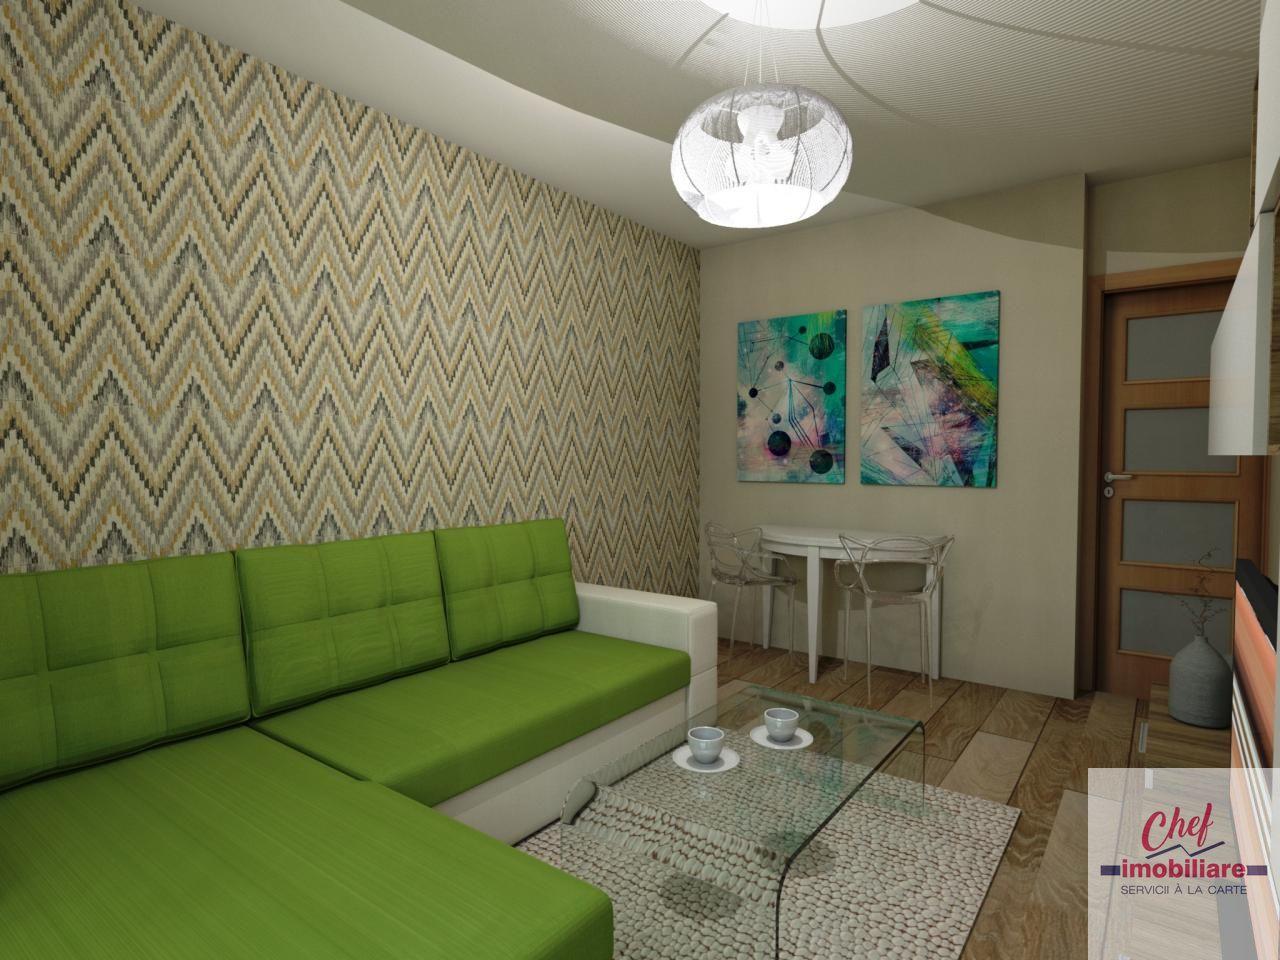 Apartament de vanzare, Iași (judet), Tătărași Nord - Foto 1